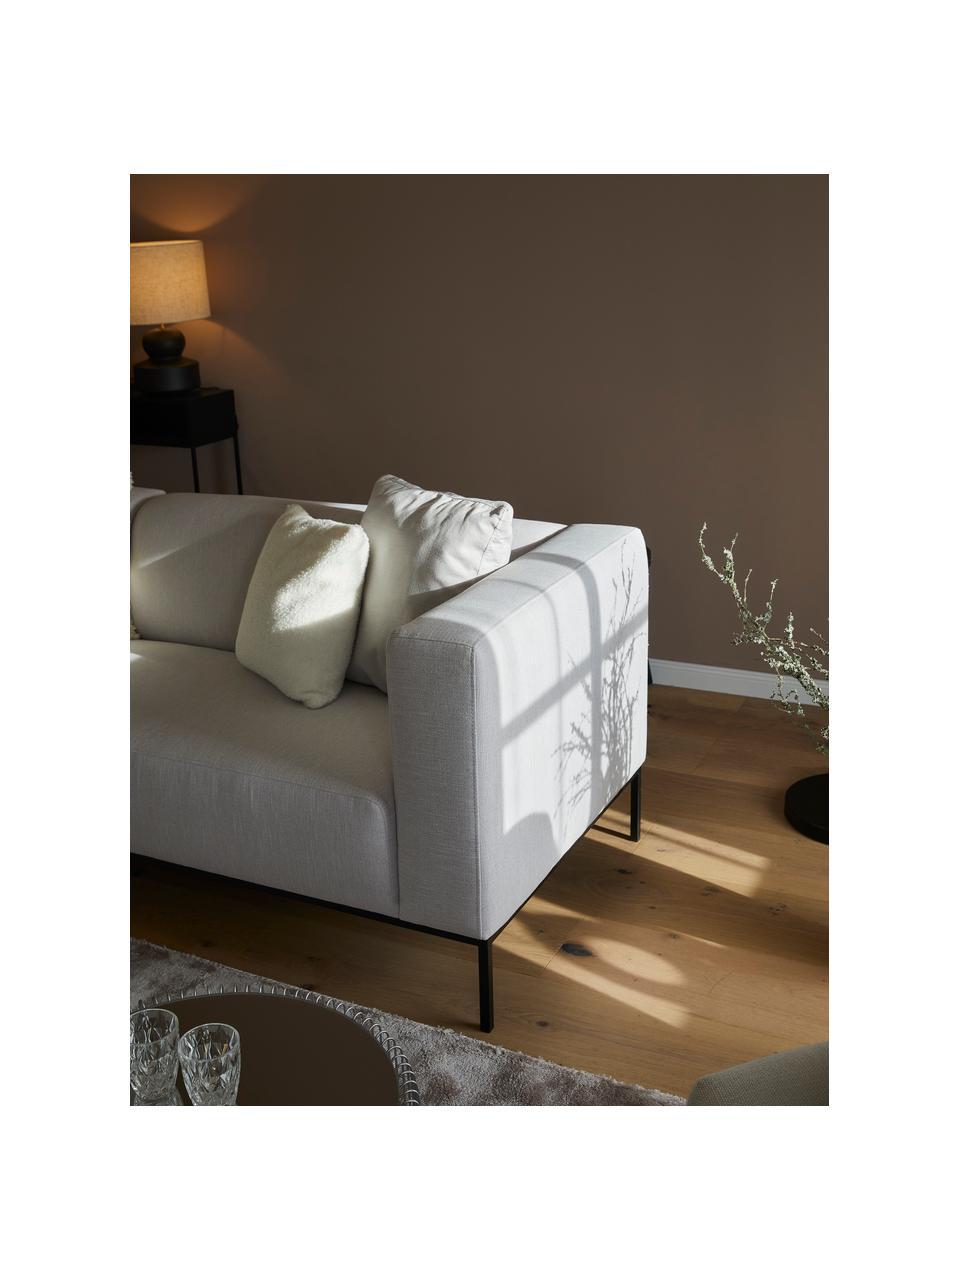 Sofa Carrie (3-Sitzer) in Grau mit Metall-Füßen, Bezug: Polyester 50.000 Scheuert, Gestell: Spanholz, Hartfaserplatte, Füße: Metall, lackiert, Webstoff Grau, B 202 x T 86 cm